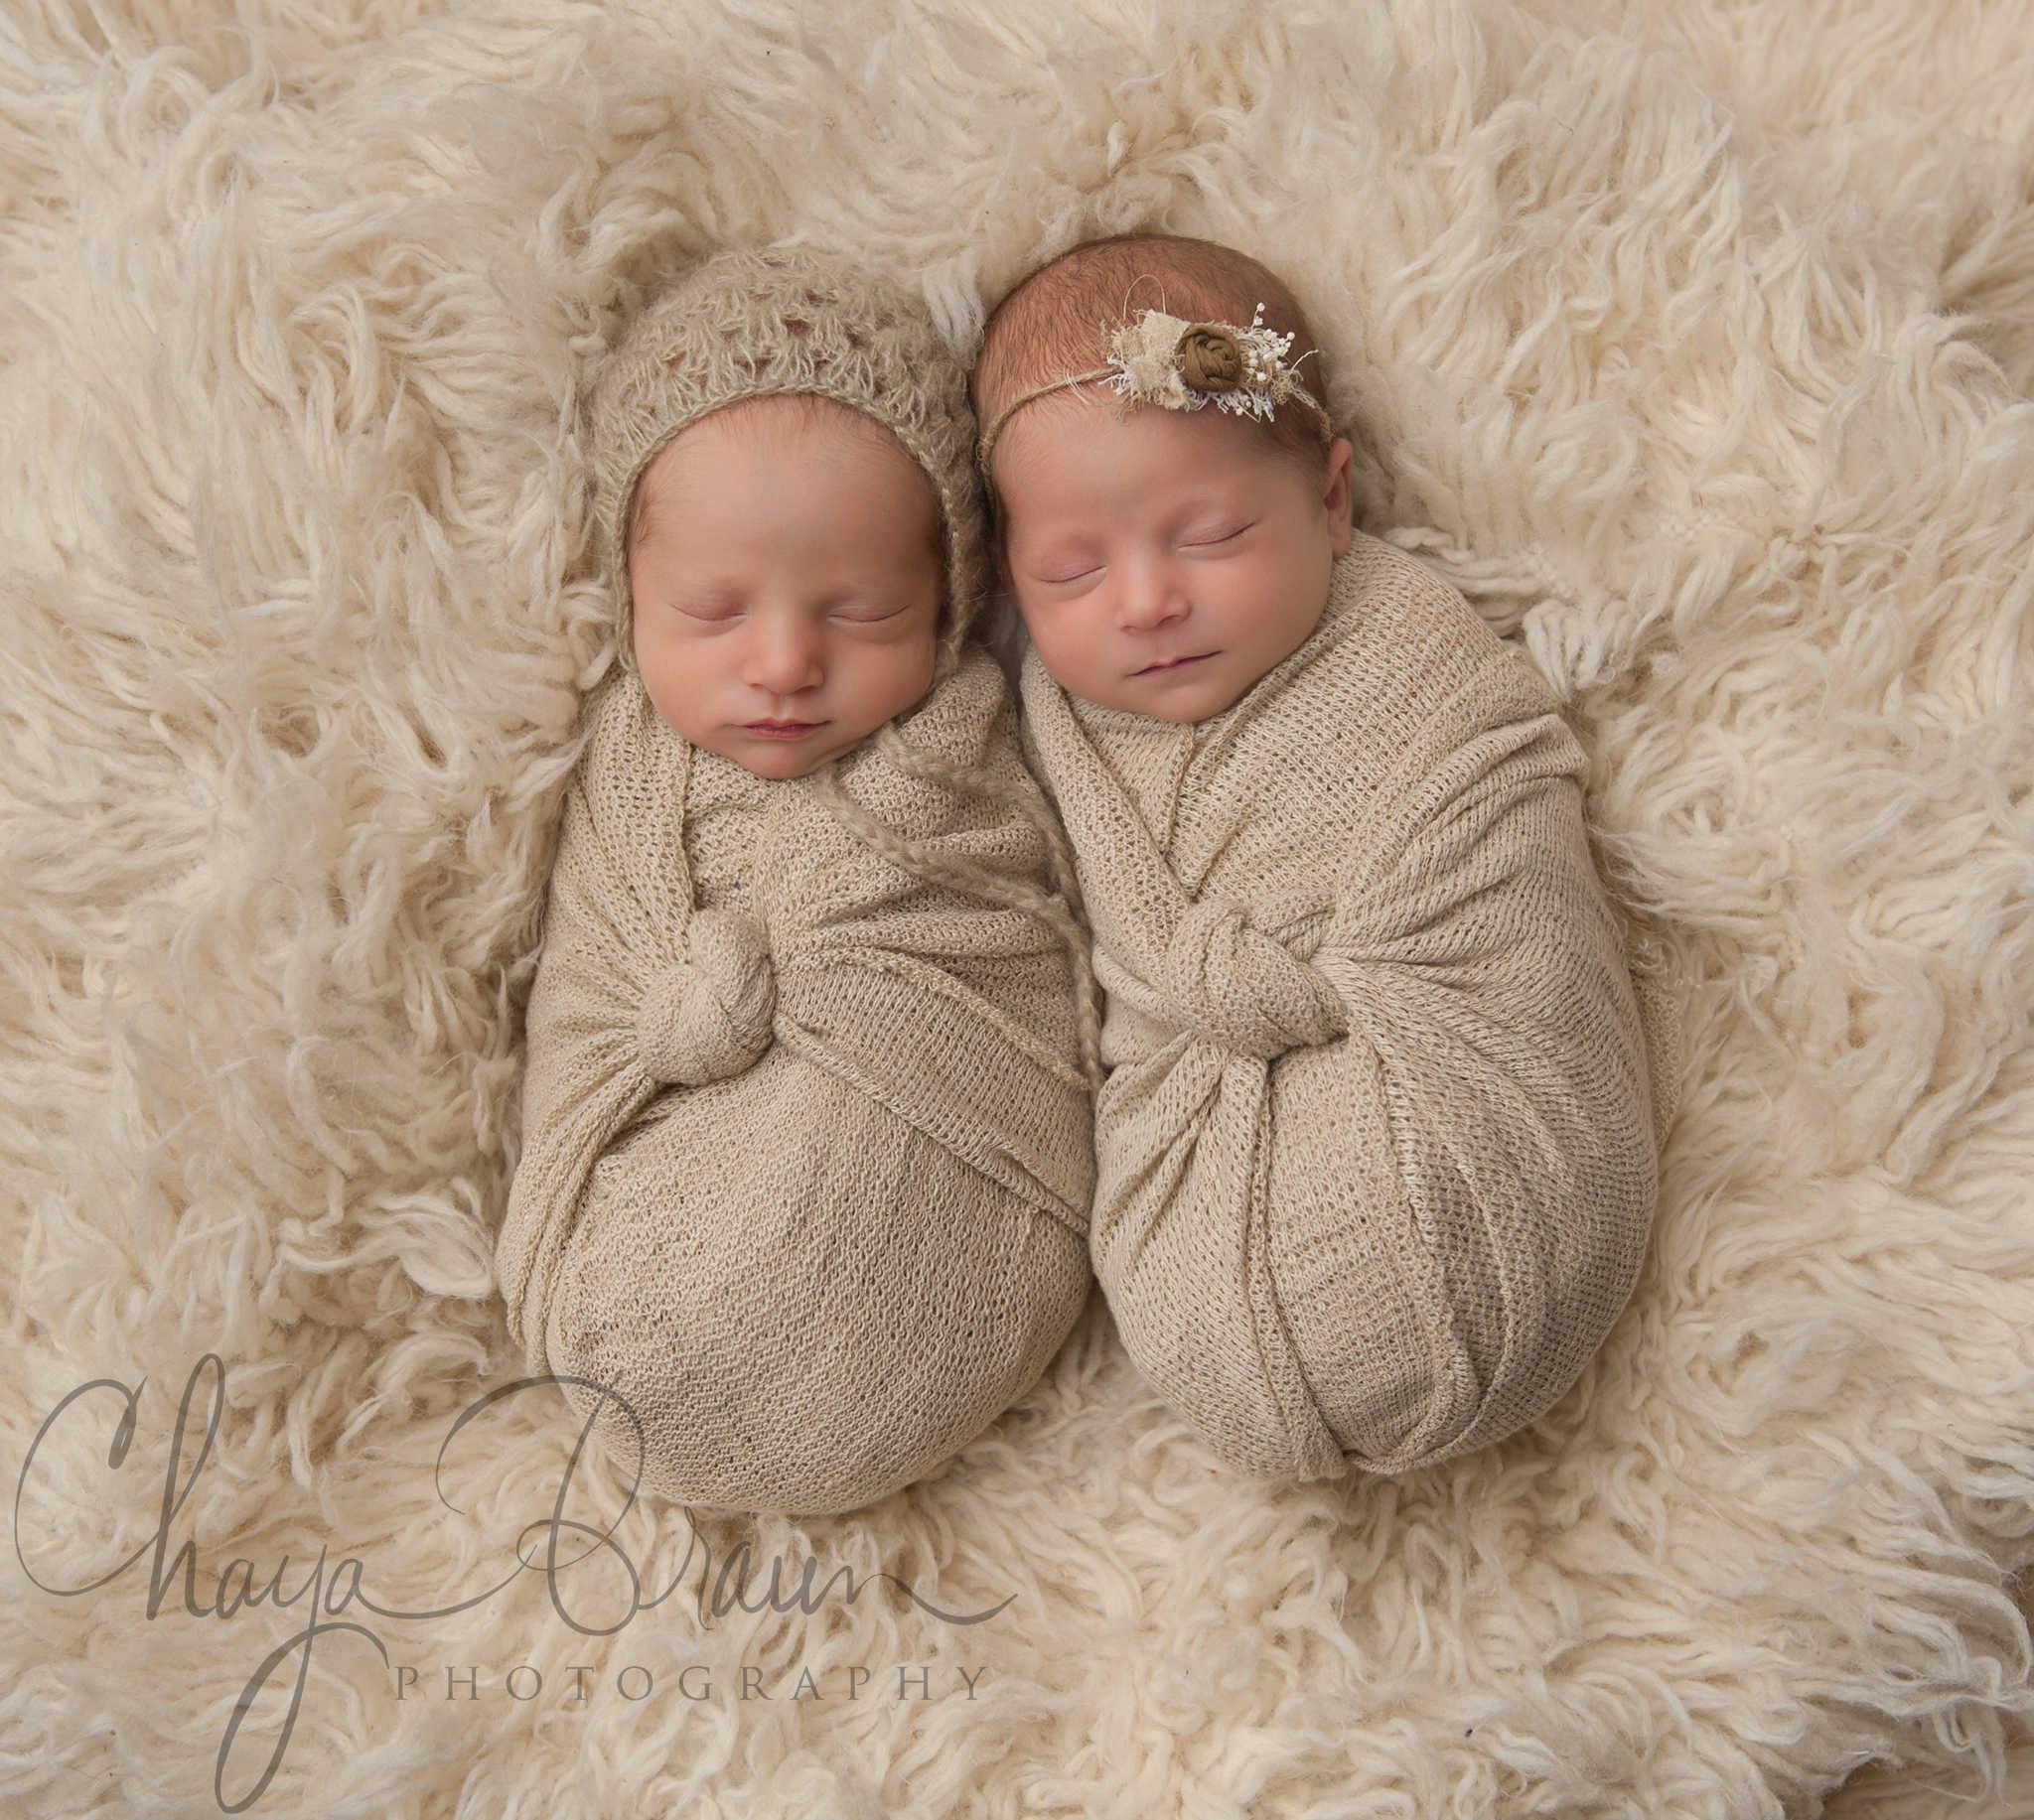 Newborn Baby Twins Photos Chaya Braun Photography